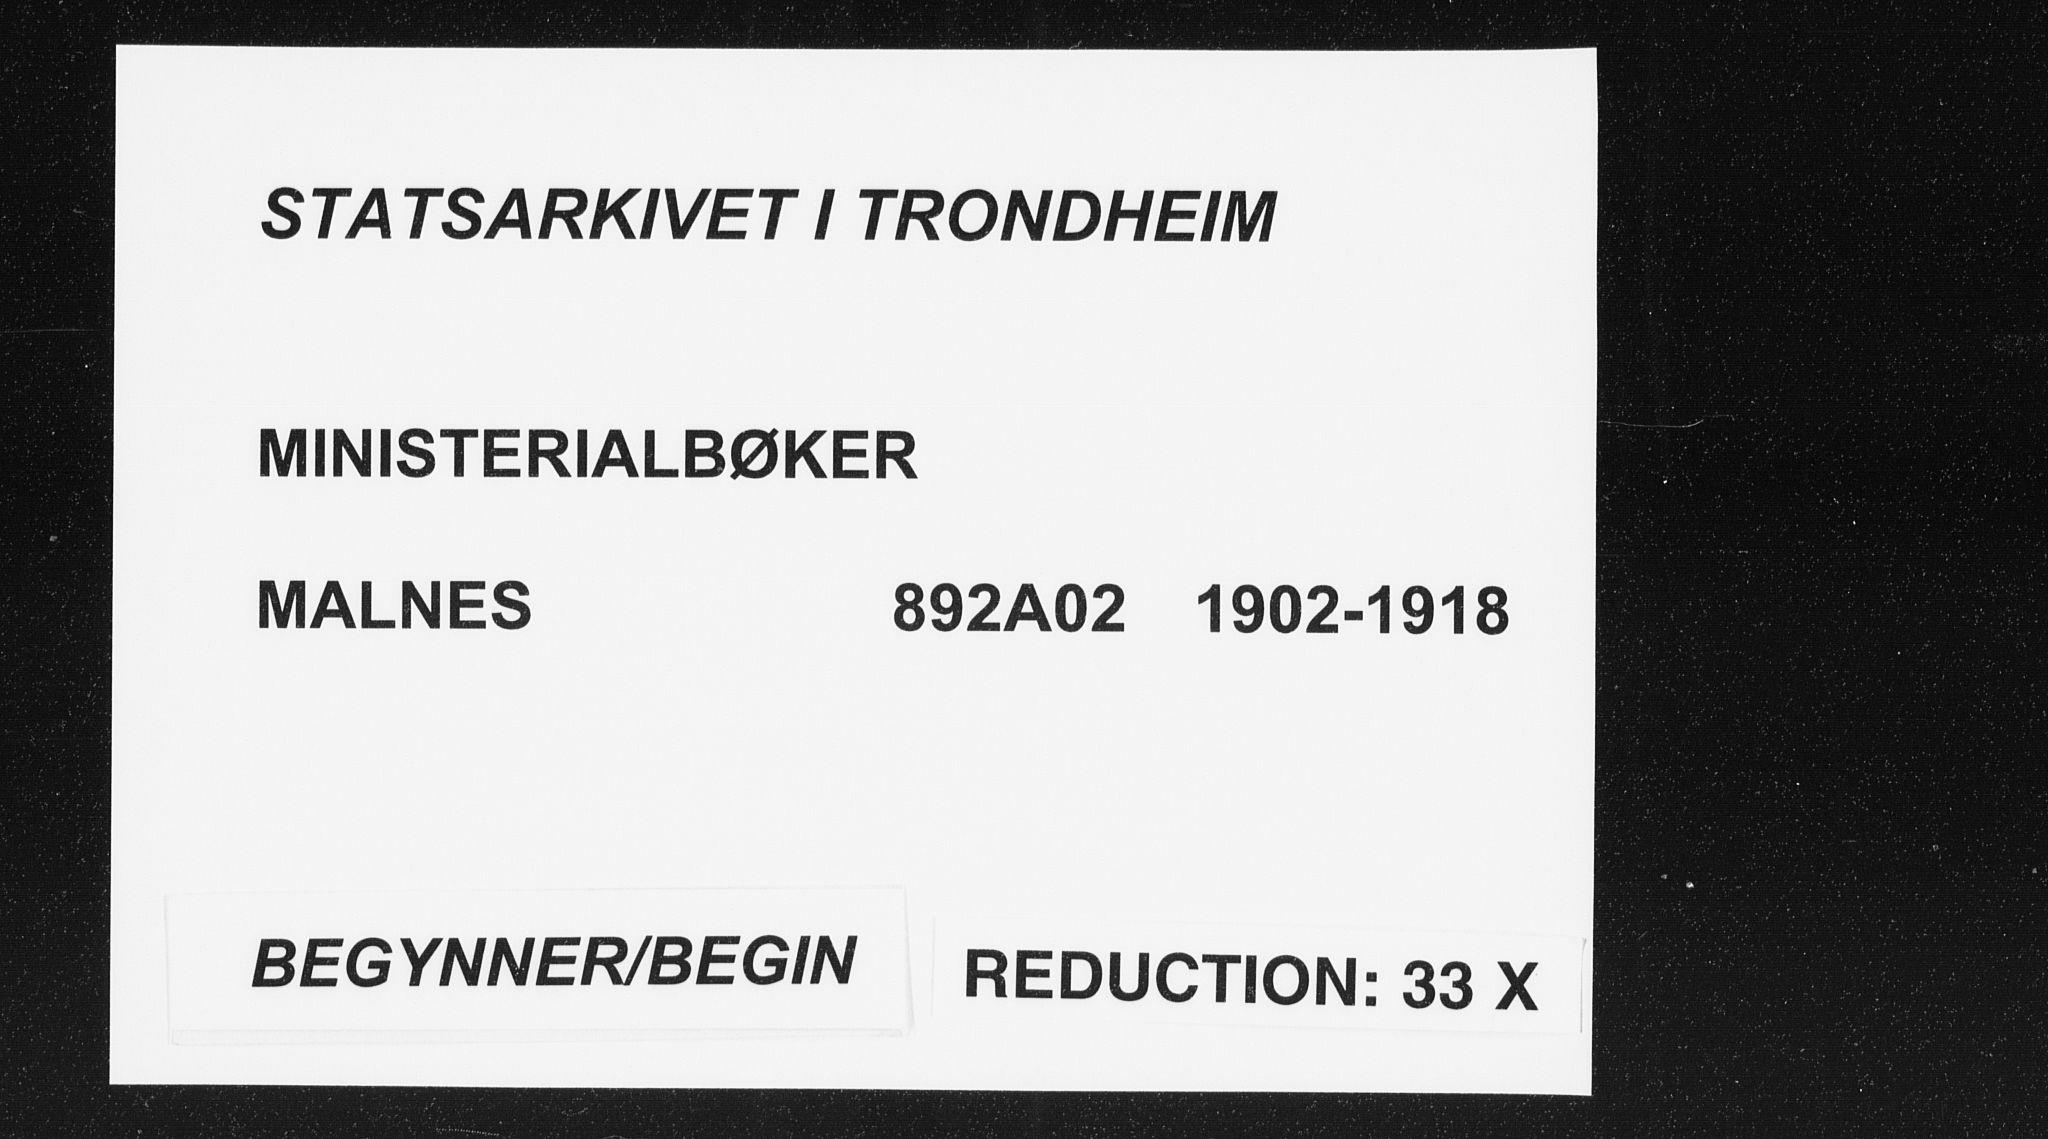 SAT, Ministerialprotokoller, klokkerbøker og fødselsregistre - Nordland, 892/L1321: Ministerialbok nr. 892A02, 1902-1918